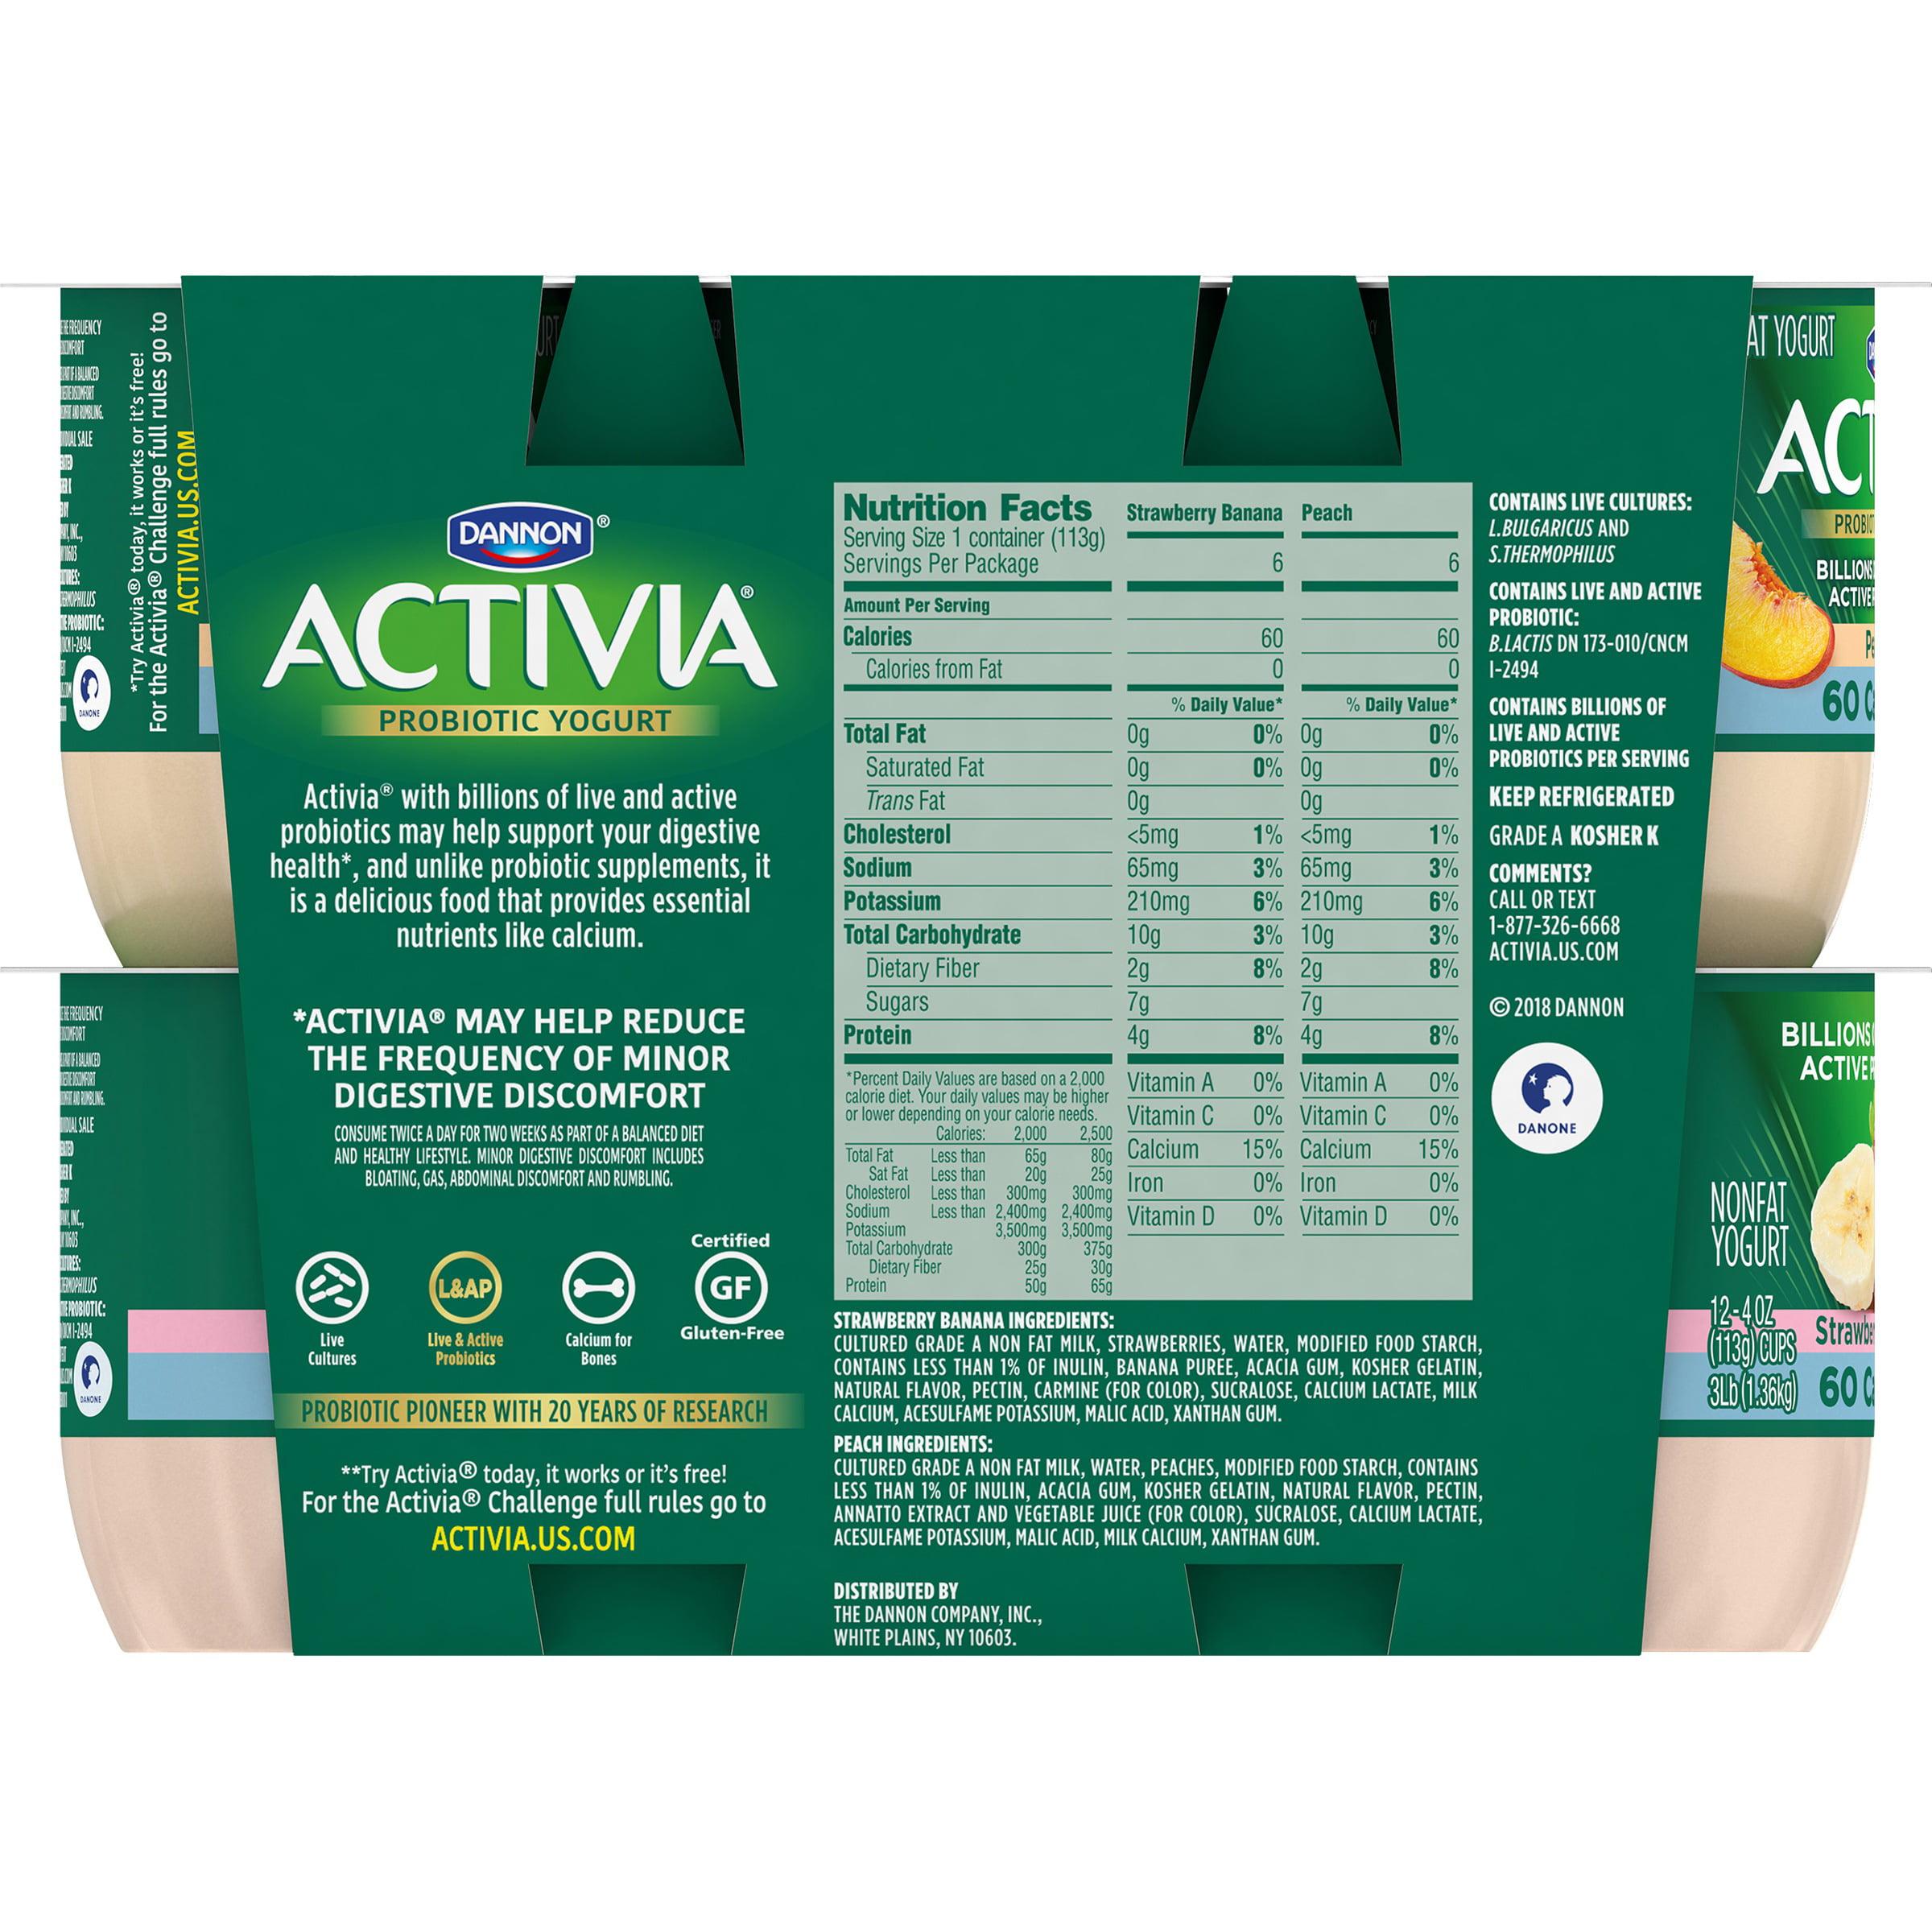 Activia Light Strawberry-Banana & Peach Nonfat Yogurt, 4 oz, 12 ct - Walmart.com